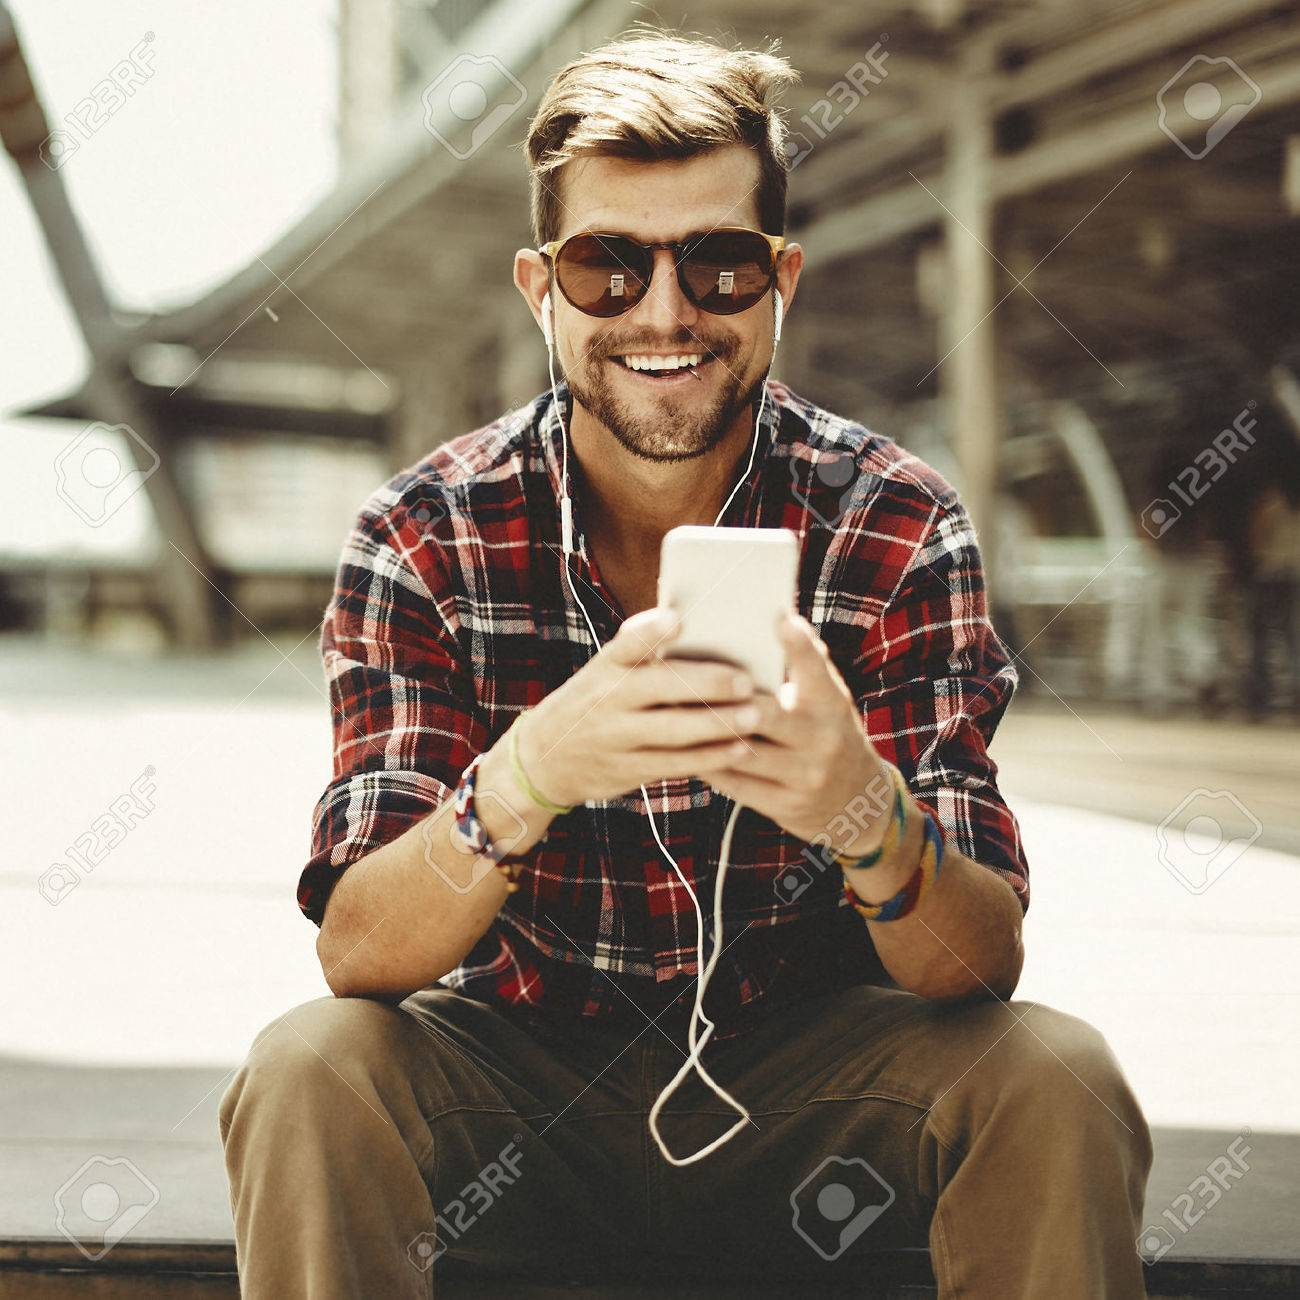 Man Sitting Listening Music Earphones Concept Banque d'images - 58723057